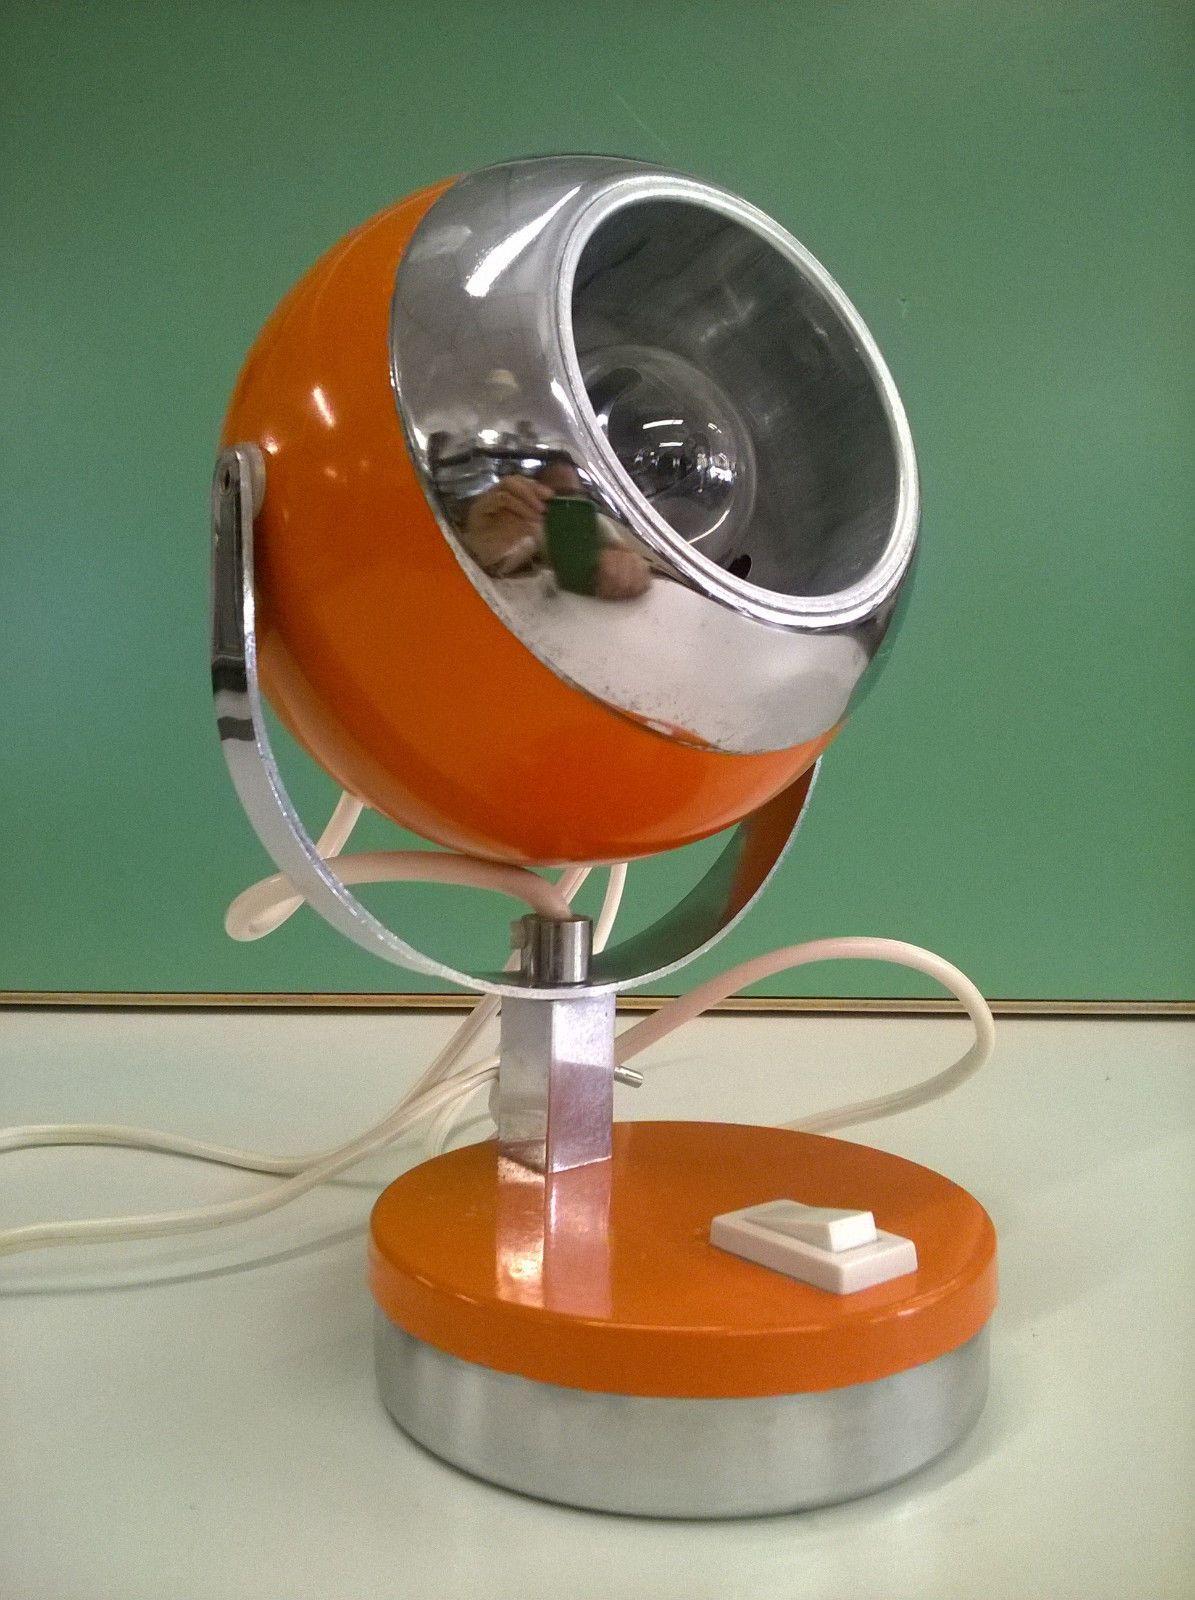 Lampada Da Tavolo Vintage Arancio Design Space Age Eyeball Anni 70 For Sale Eur 49 90 See Photos Mone Lampade Da Tavolo Vintage Lampade Da Tavolo Lampade